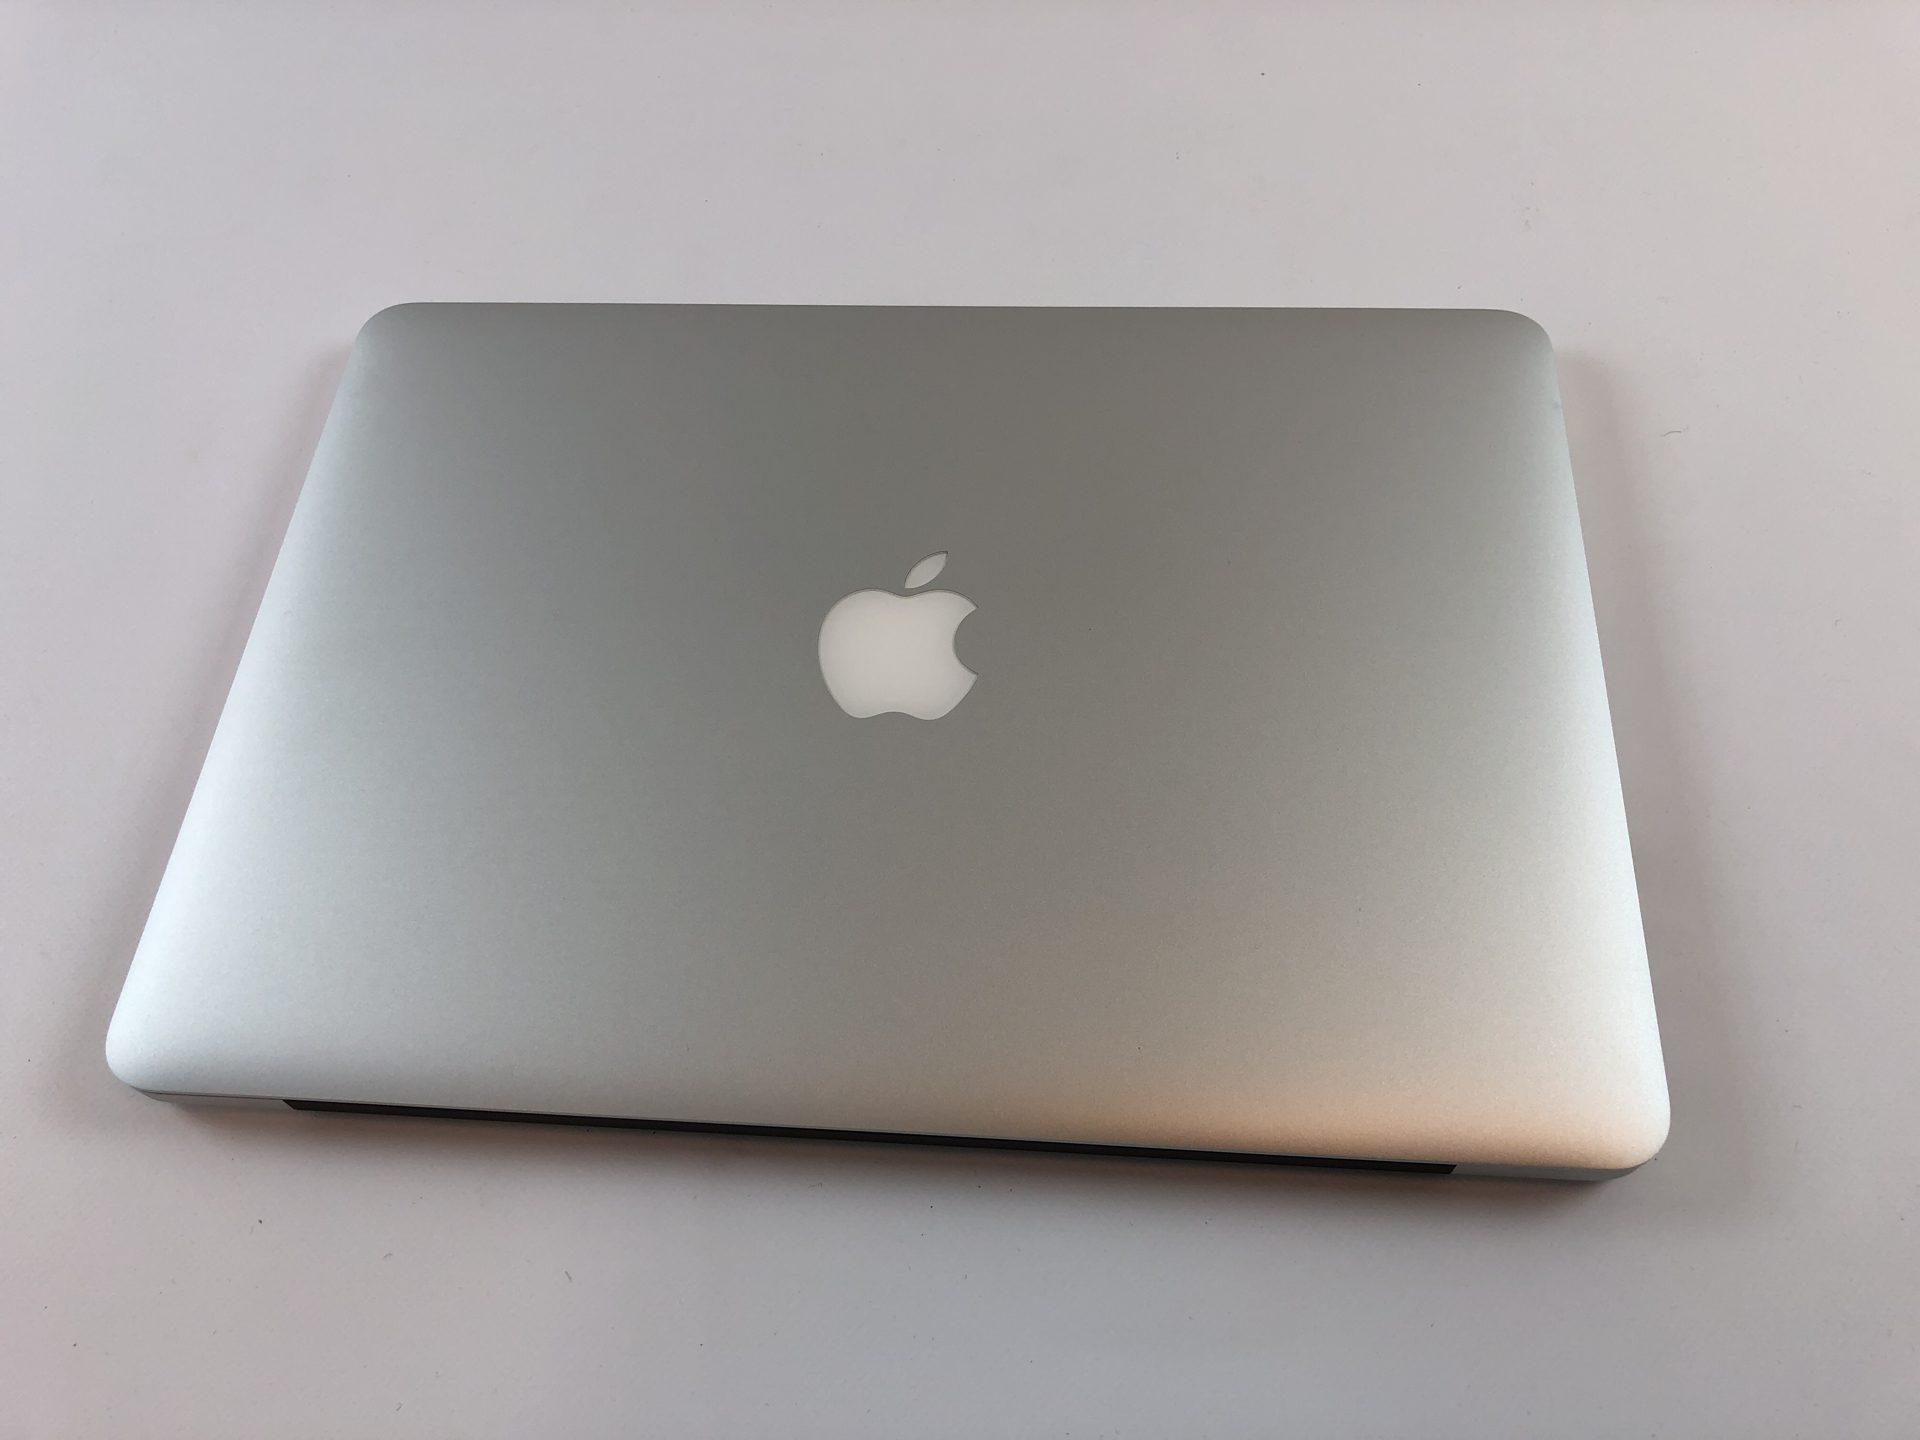 "MacBook Pro Retina 13"" Early 2015 (Intel Core i7 3.1 GHz 16 GB RAM 256 GB SSD), Intel Core i7 3.1 GHz, 16 GB RAM, 256 GB SSD, Kuva 2"